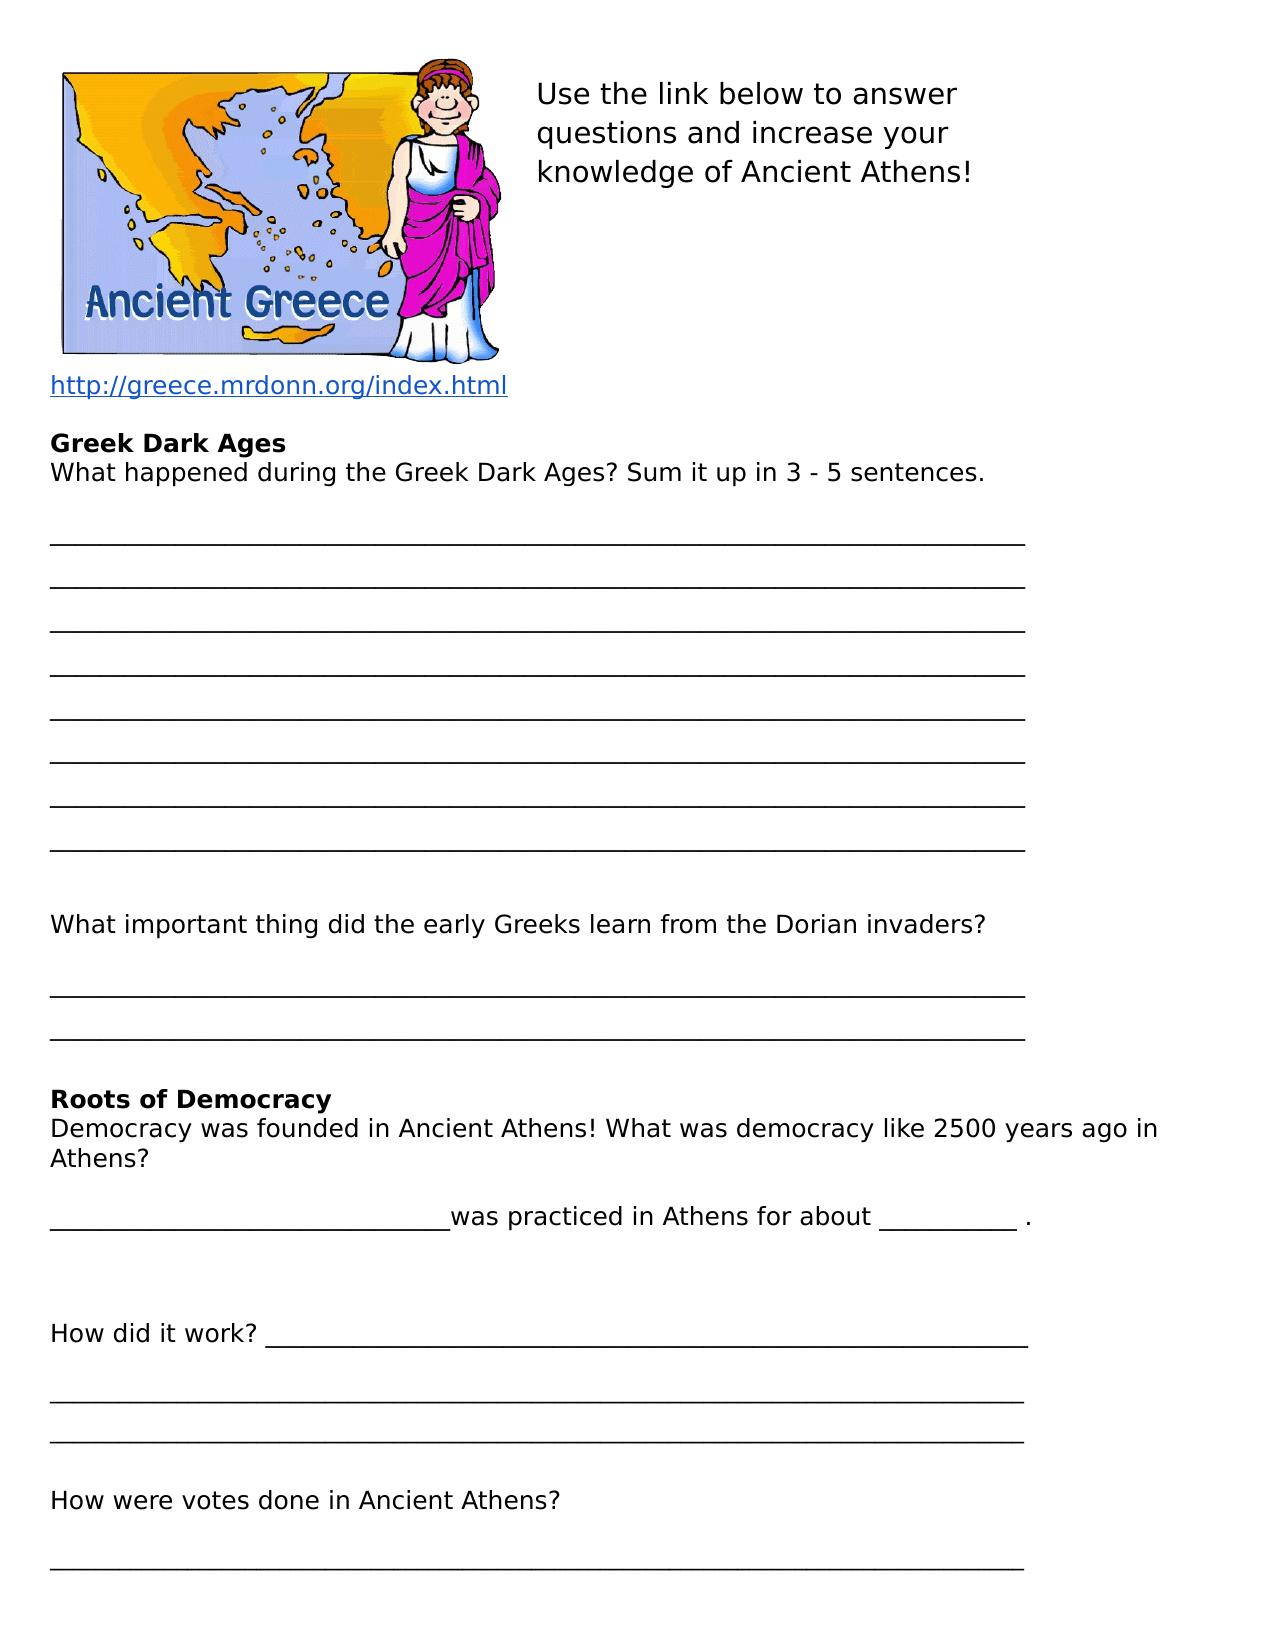 Ancient Athens Webquest Resource Preview